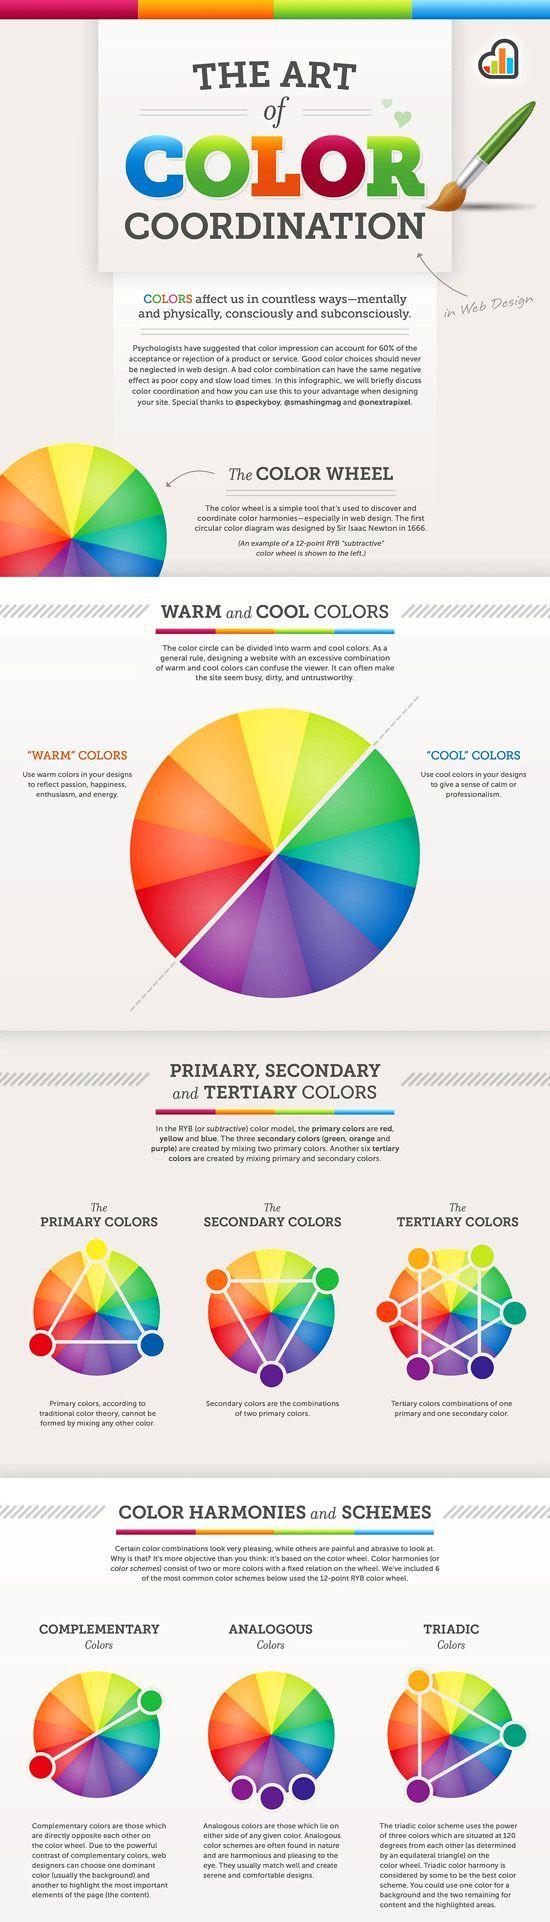 25+ trending Tertiary color ideas on Pinterest   What are tertiary colors, Tertiary color wheel ...